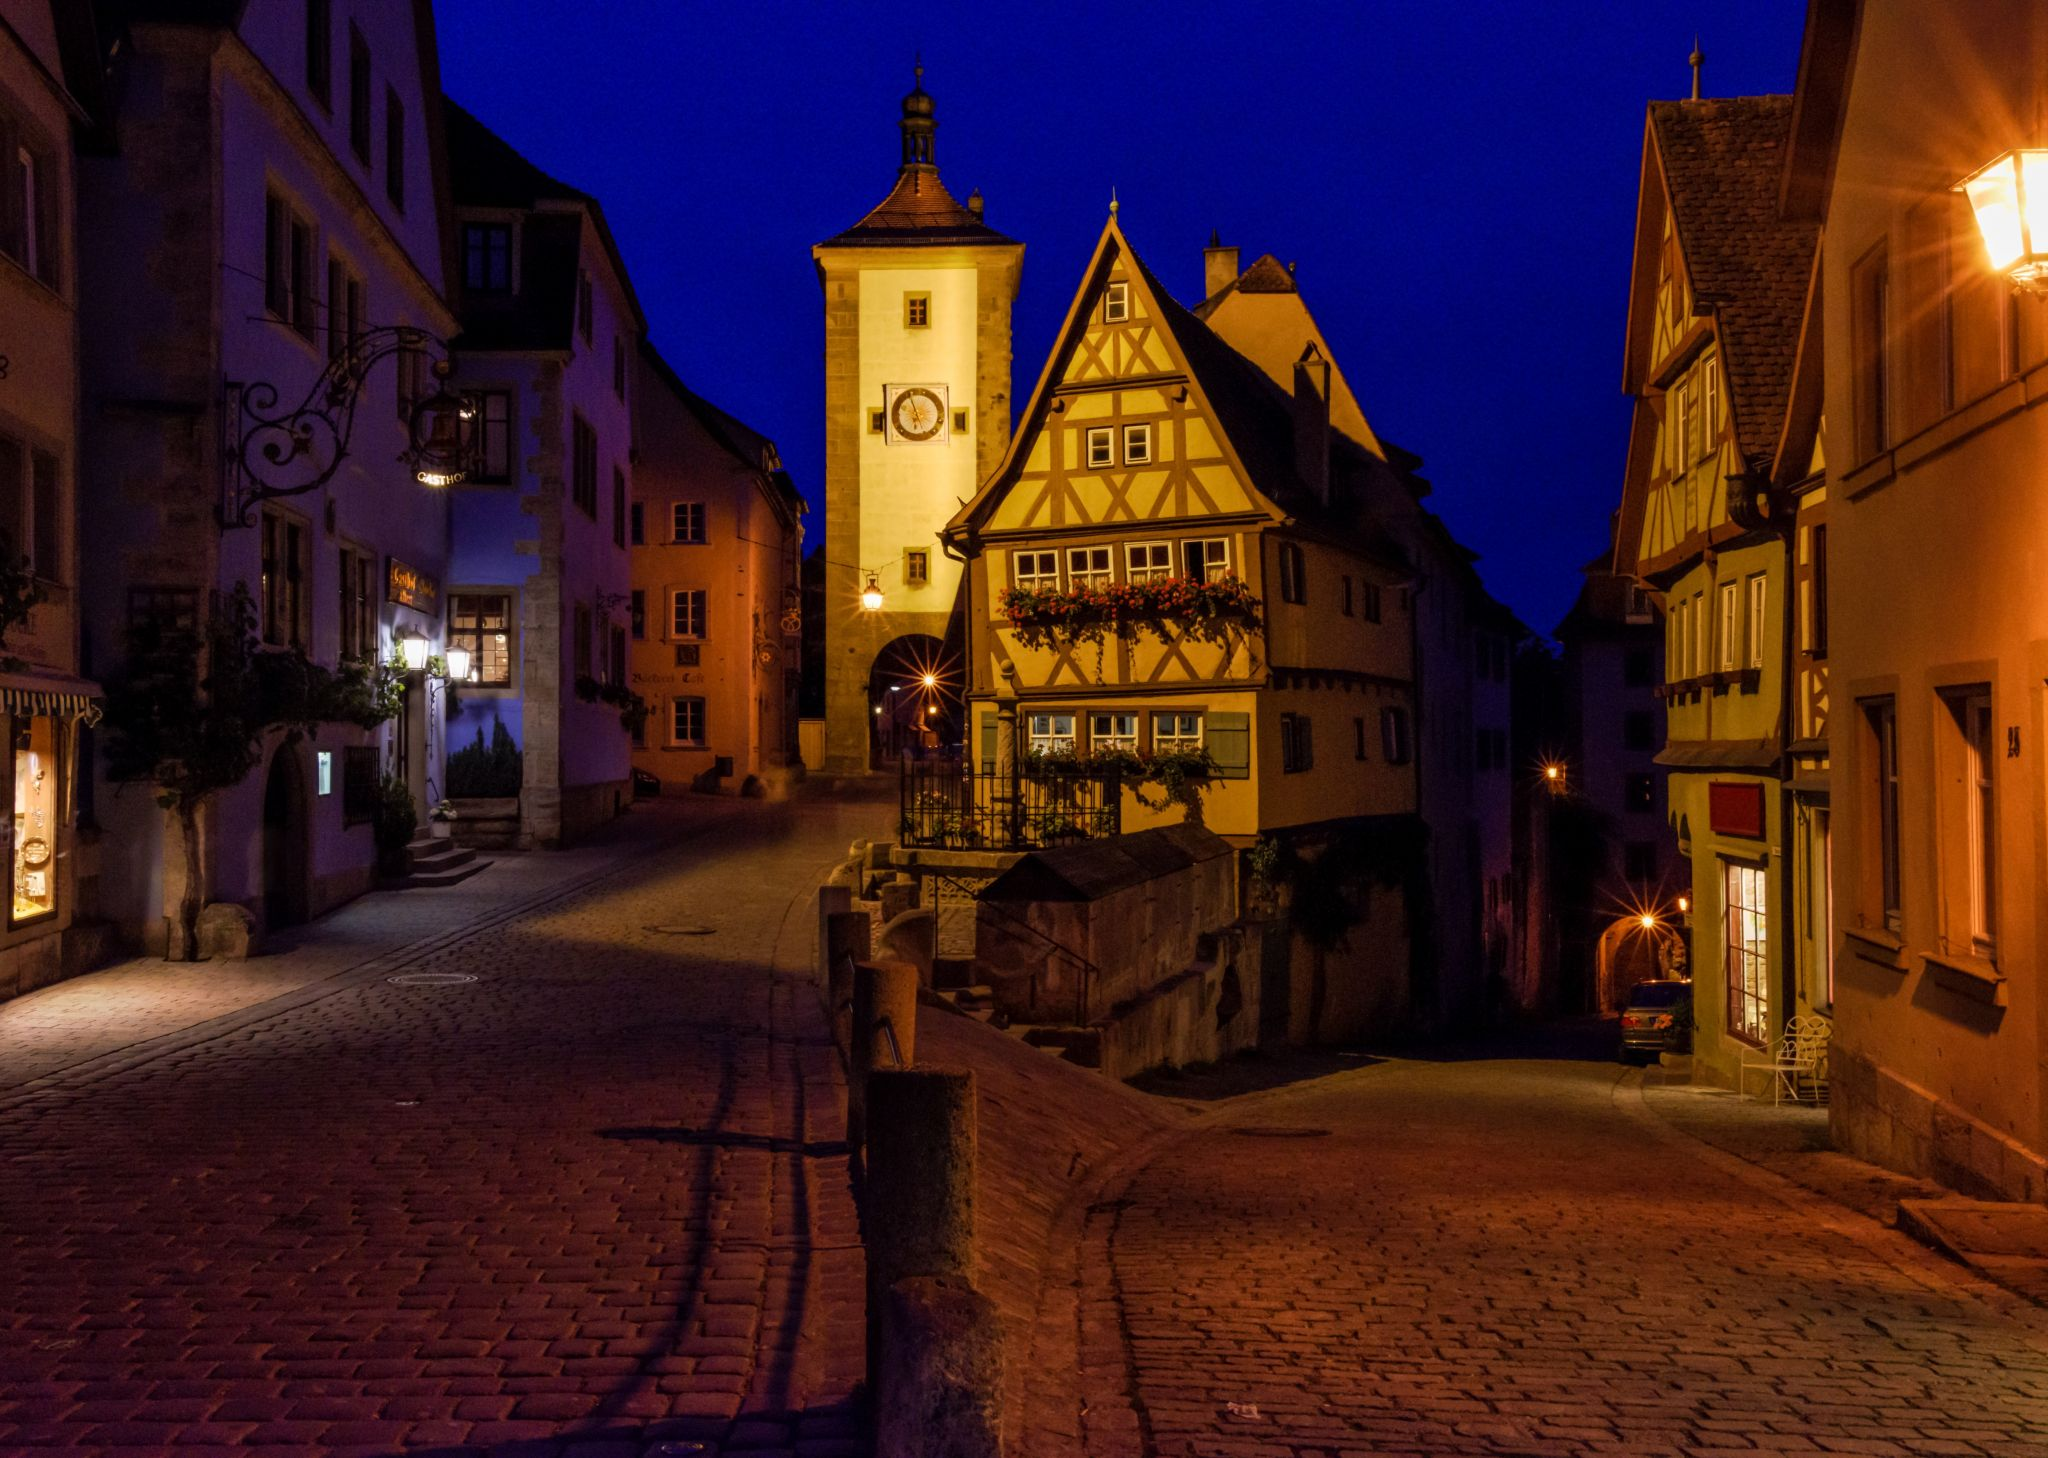 Plonlein, Germany